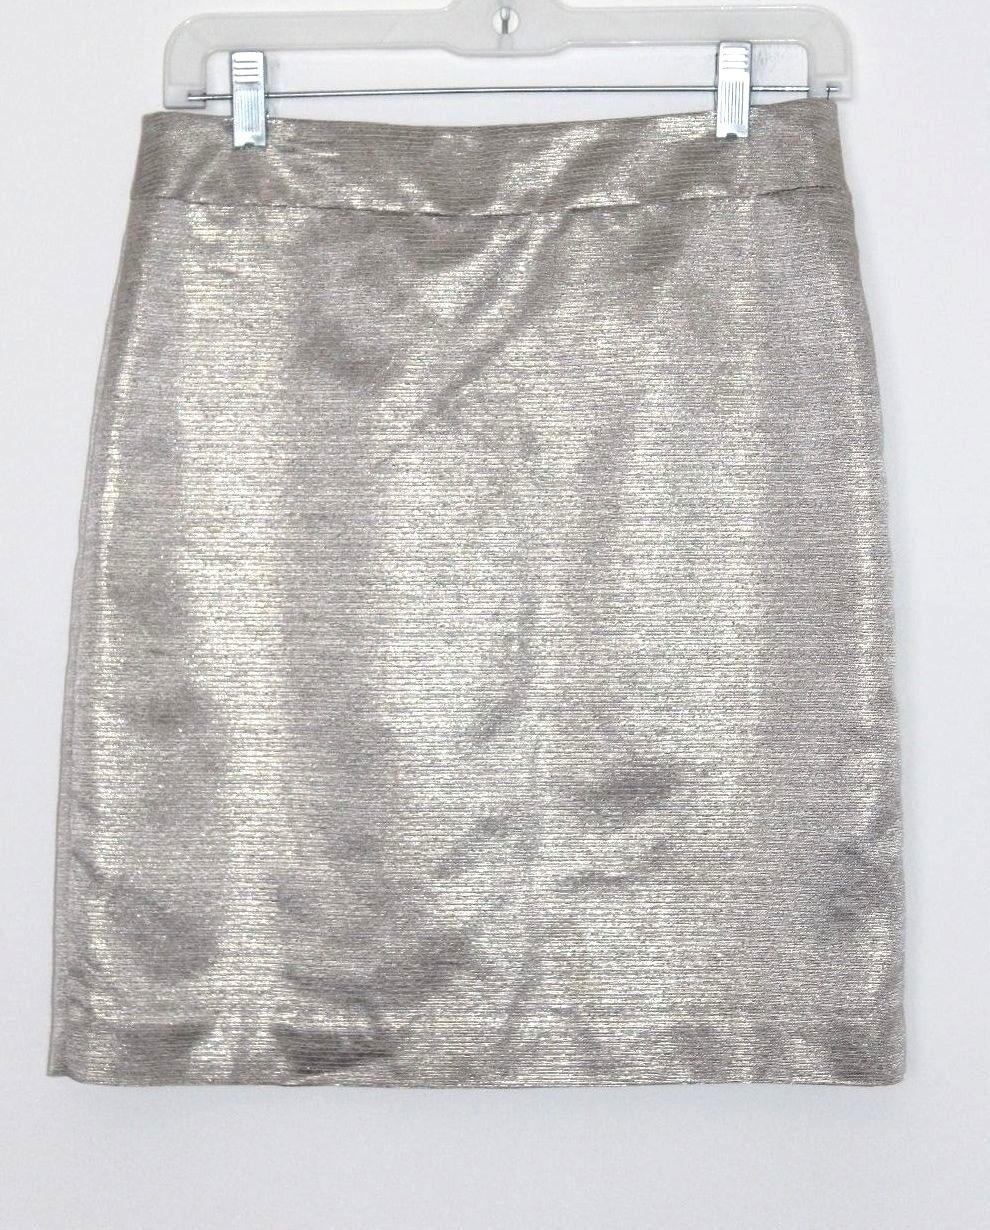 Ann Taylor LOFT - 4 (S) - gold Metallic Acetate Cotton Woven Mini Pencil Skirt